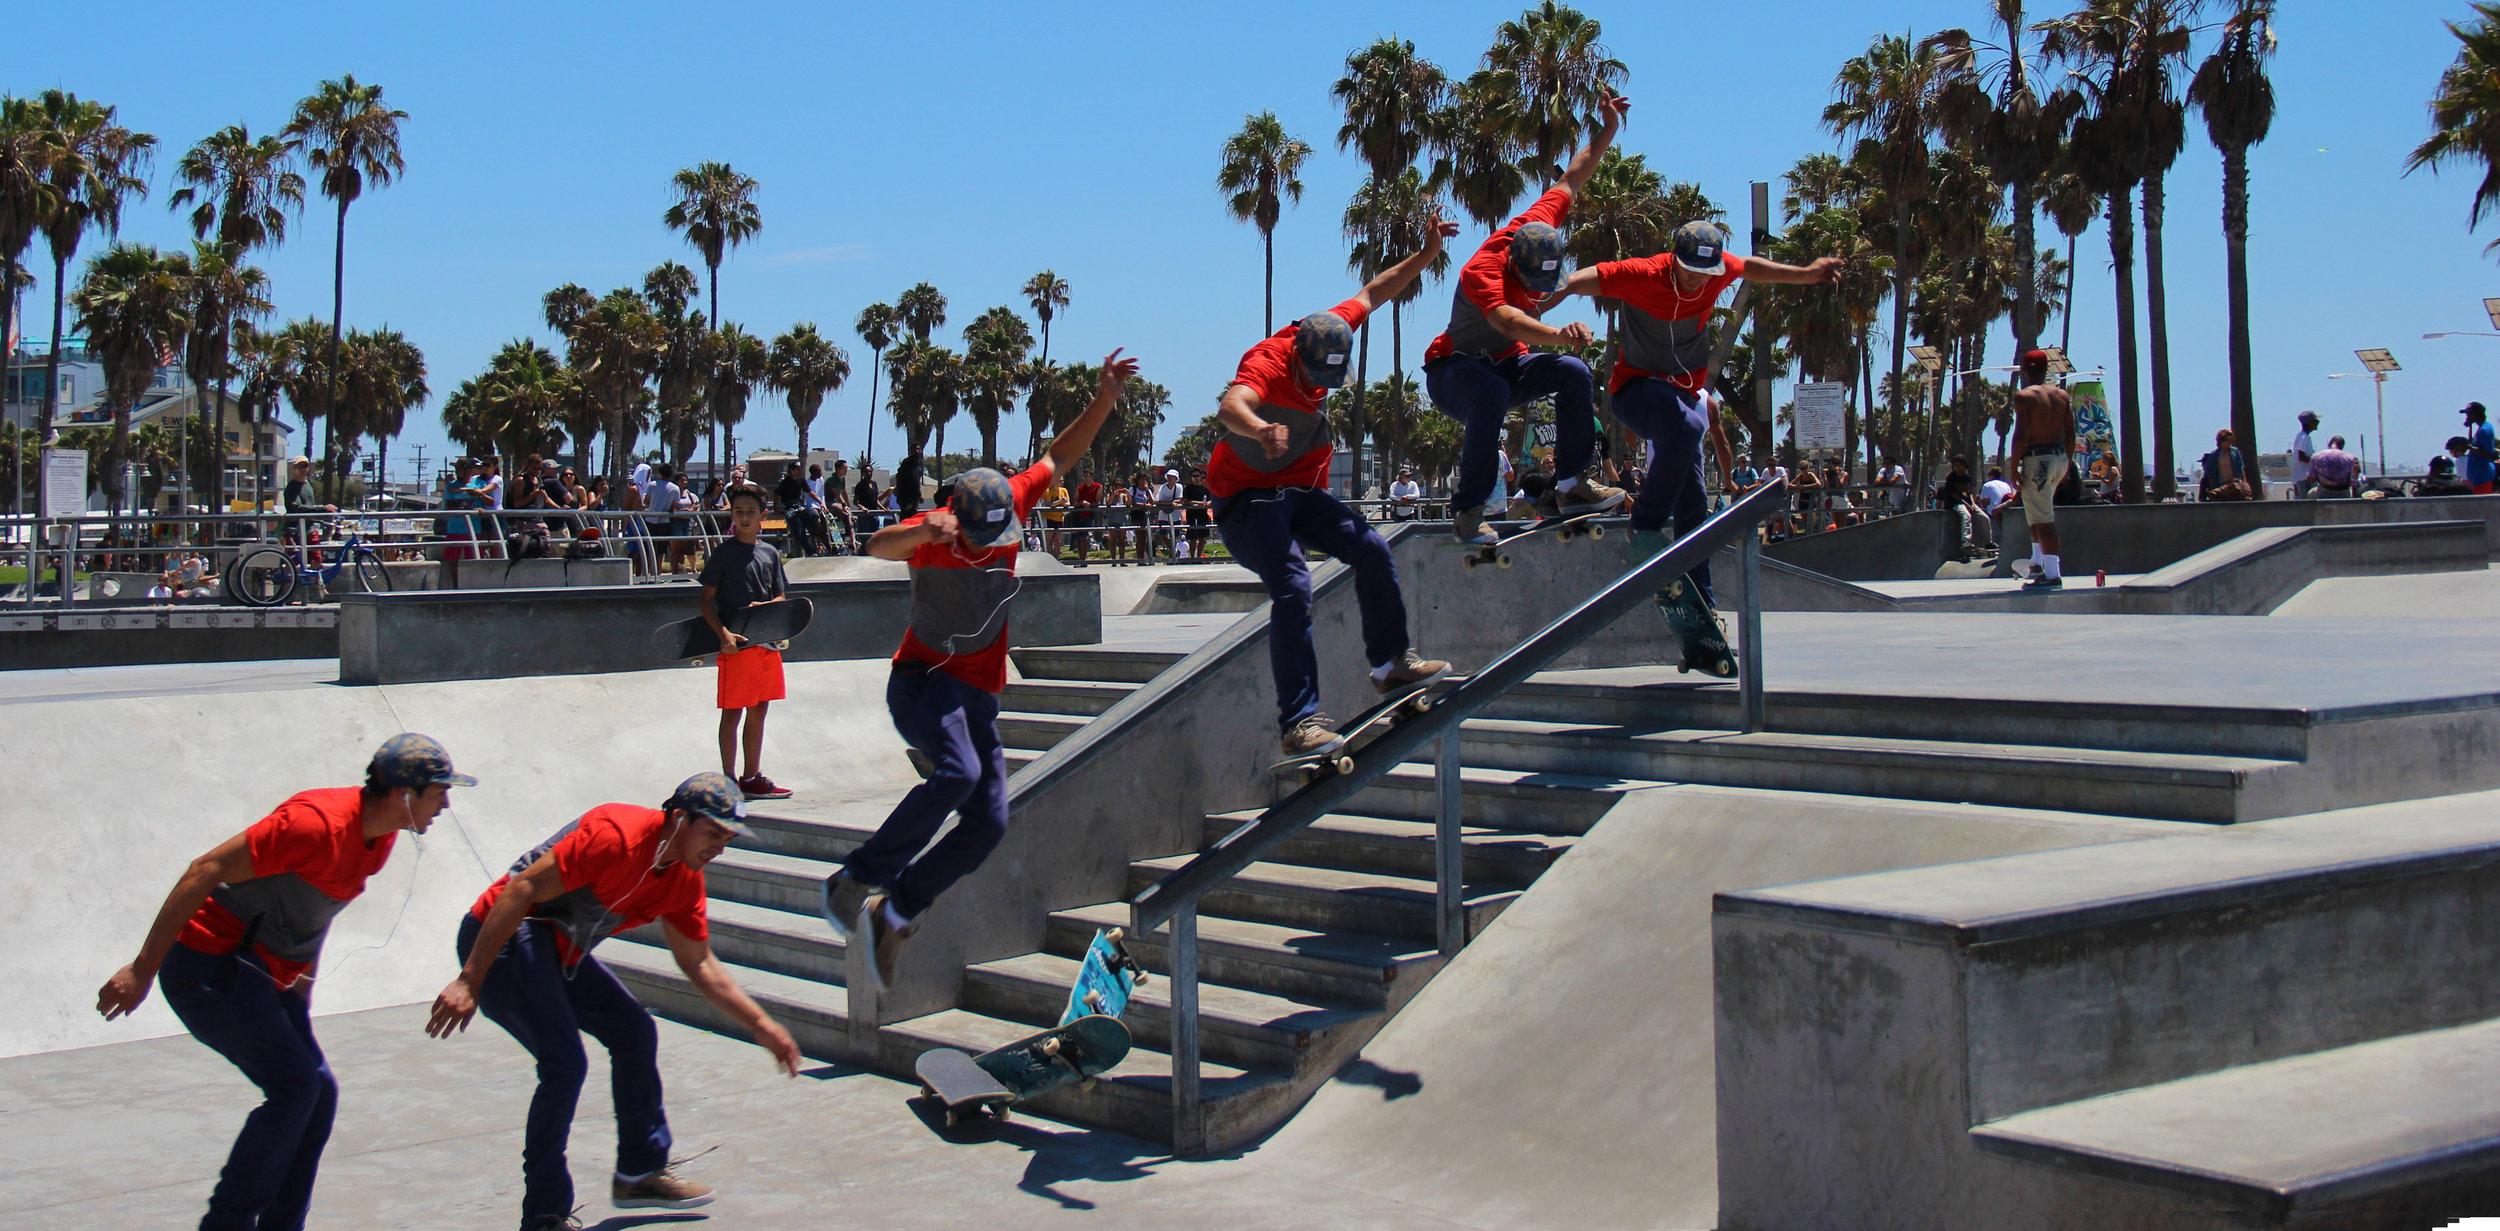 Venice Beach Skate Park, August 14, 2015